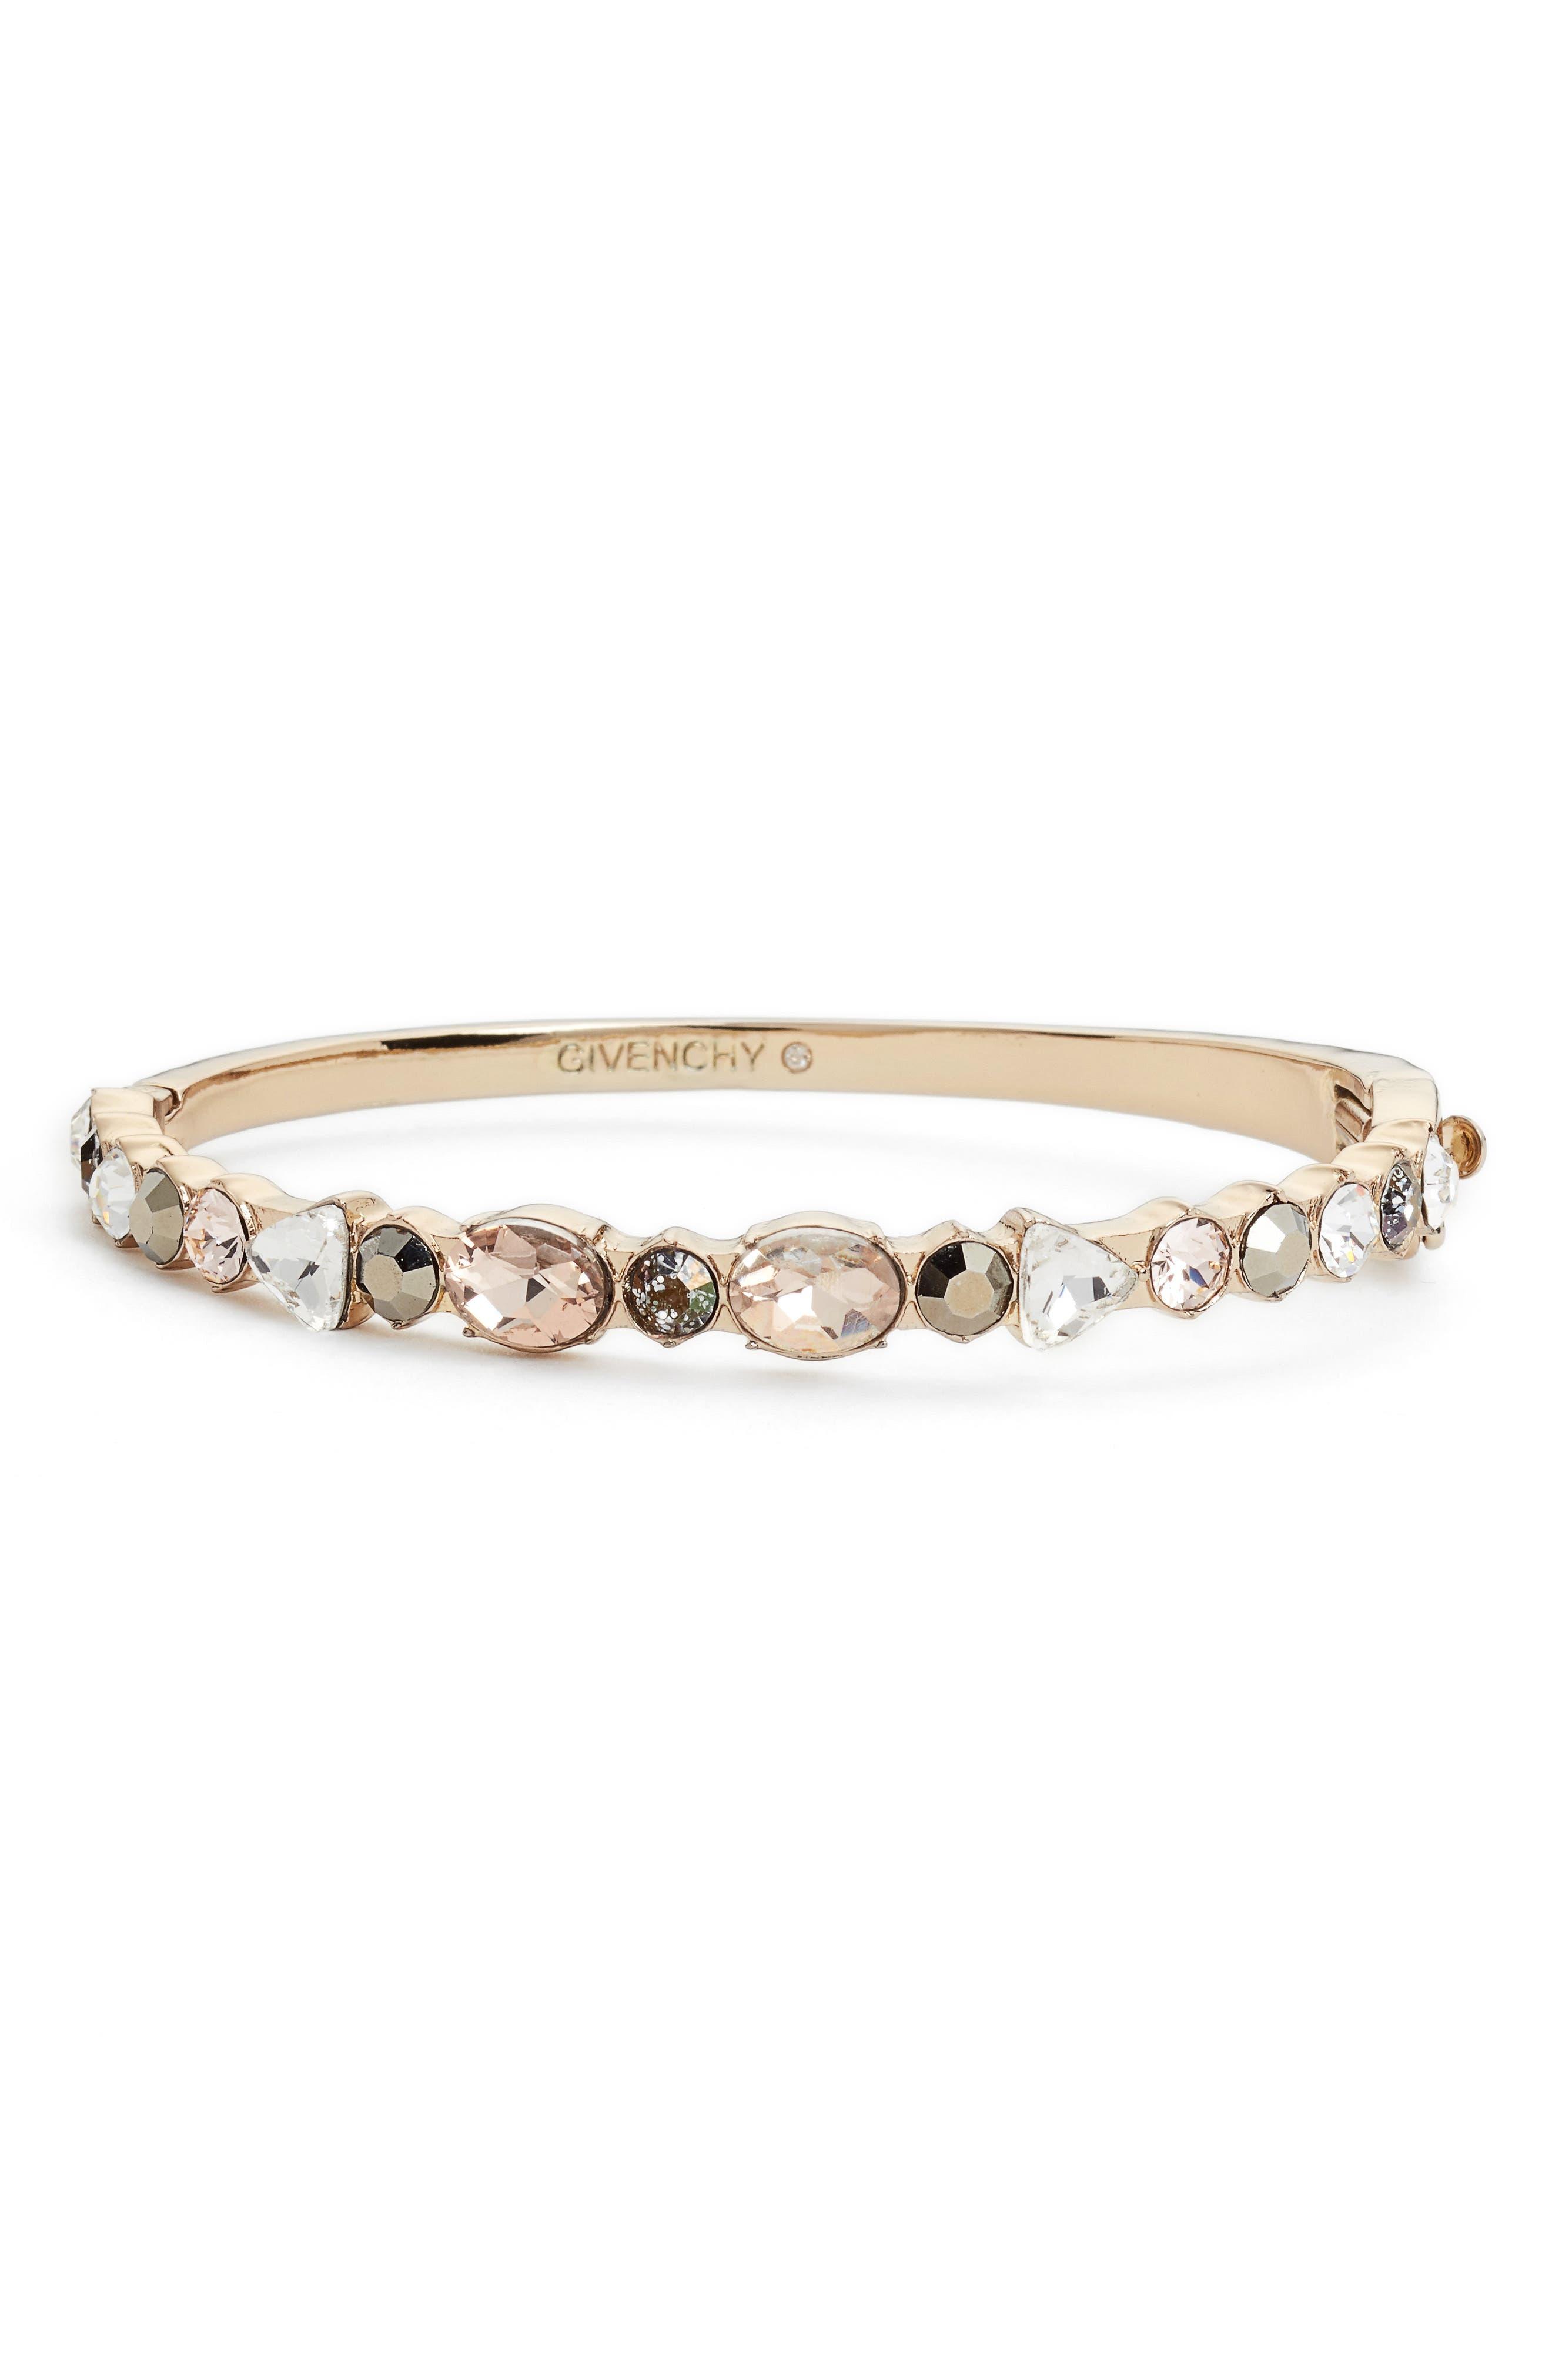 Swarovski Crystal Bracelet,                         Main,                         color, Gold